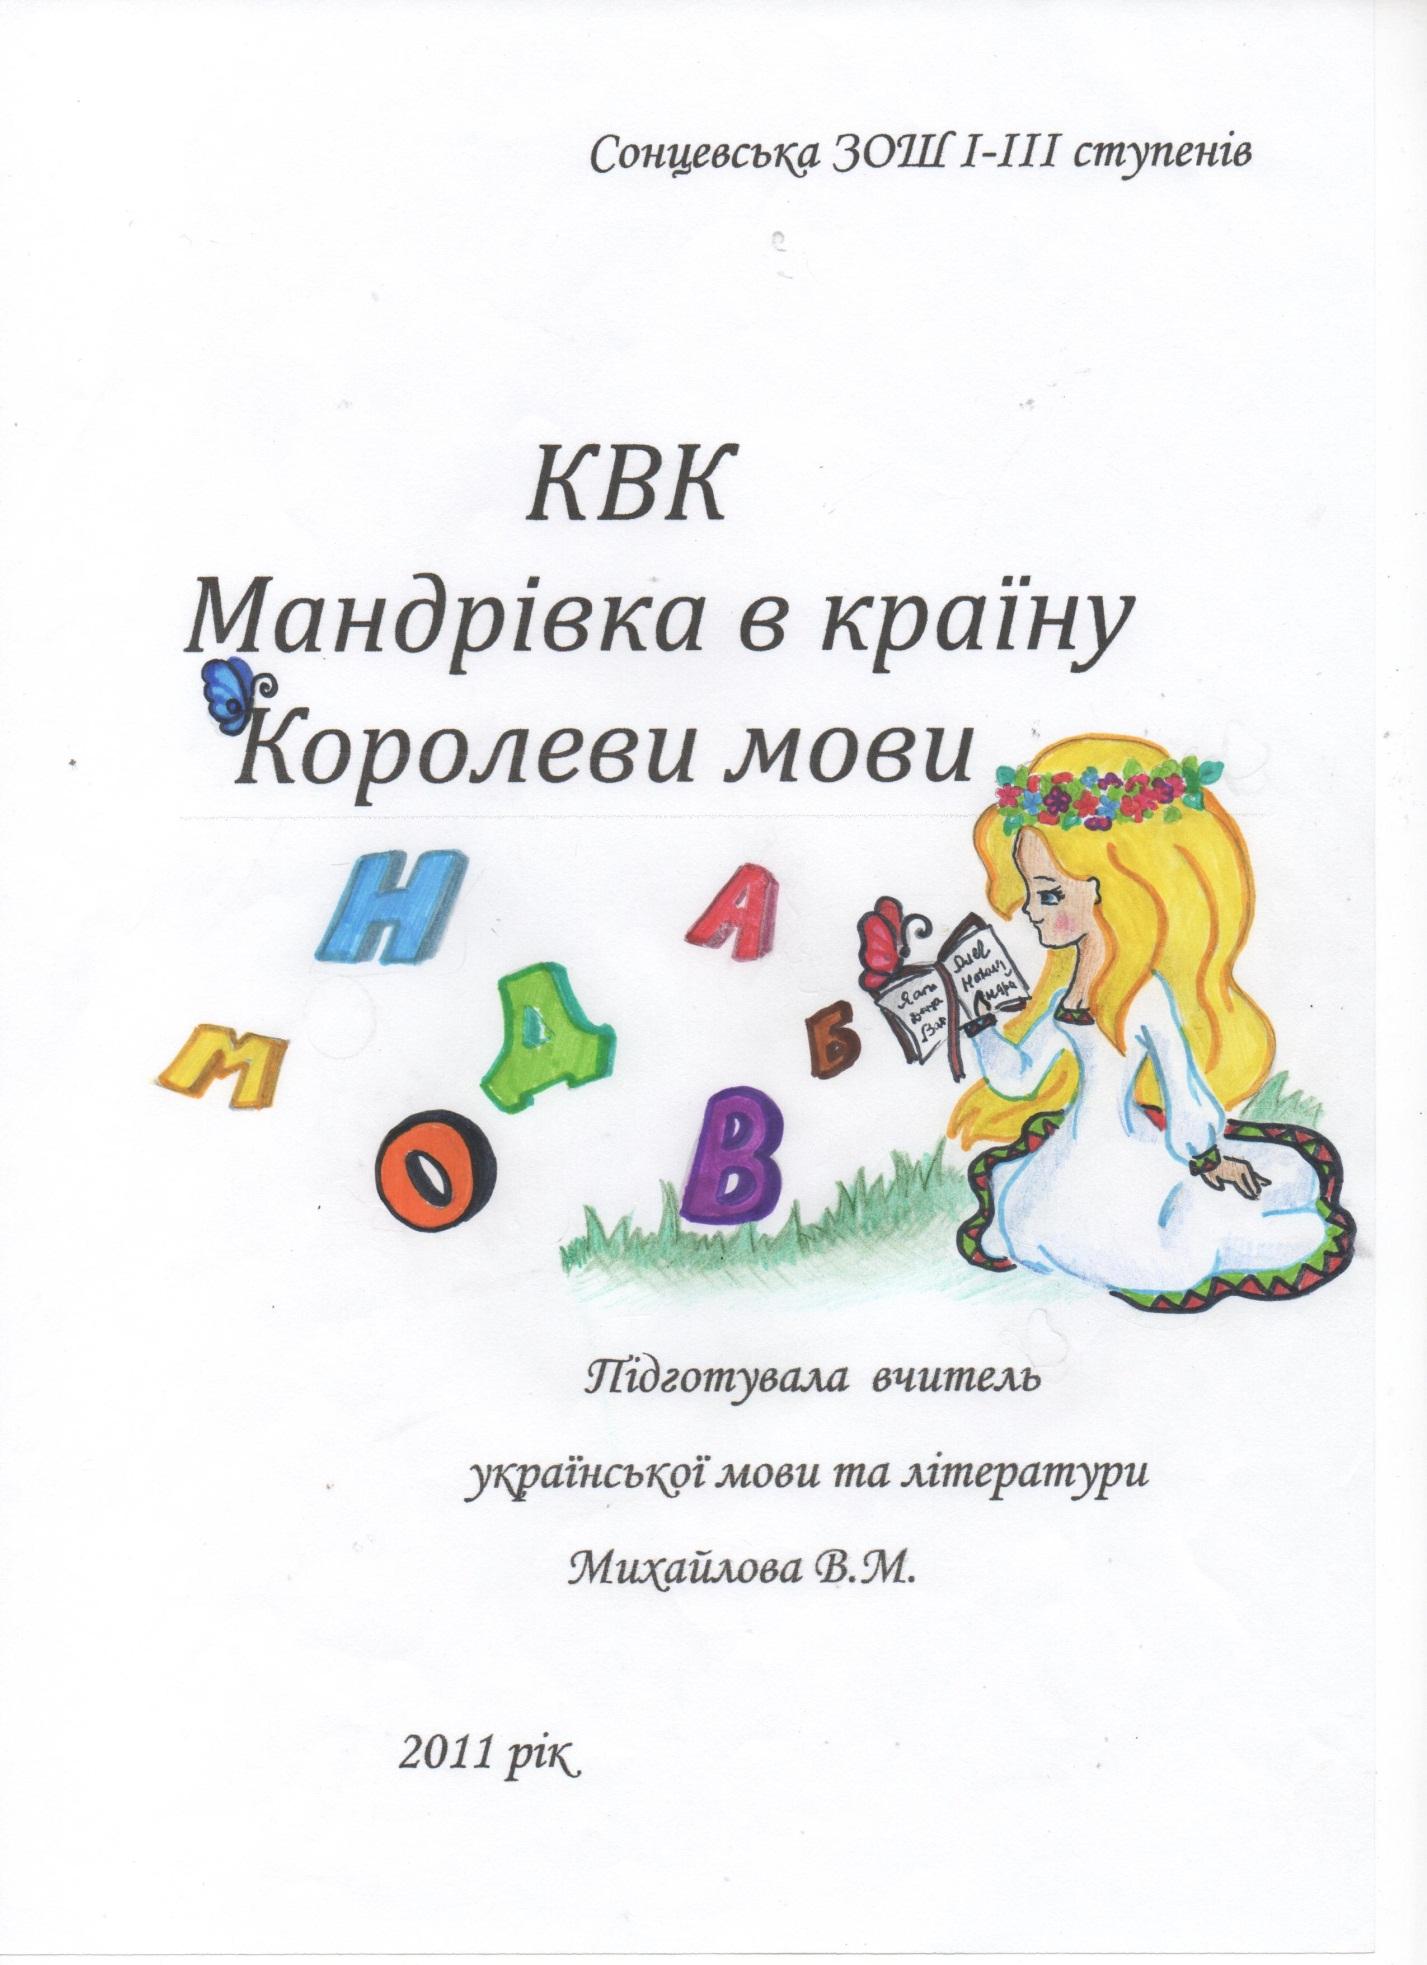 C:\Users\Валентина\Documents\отправка сайт\КВК\001.jpg